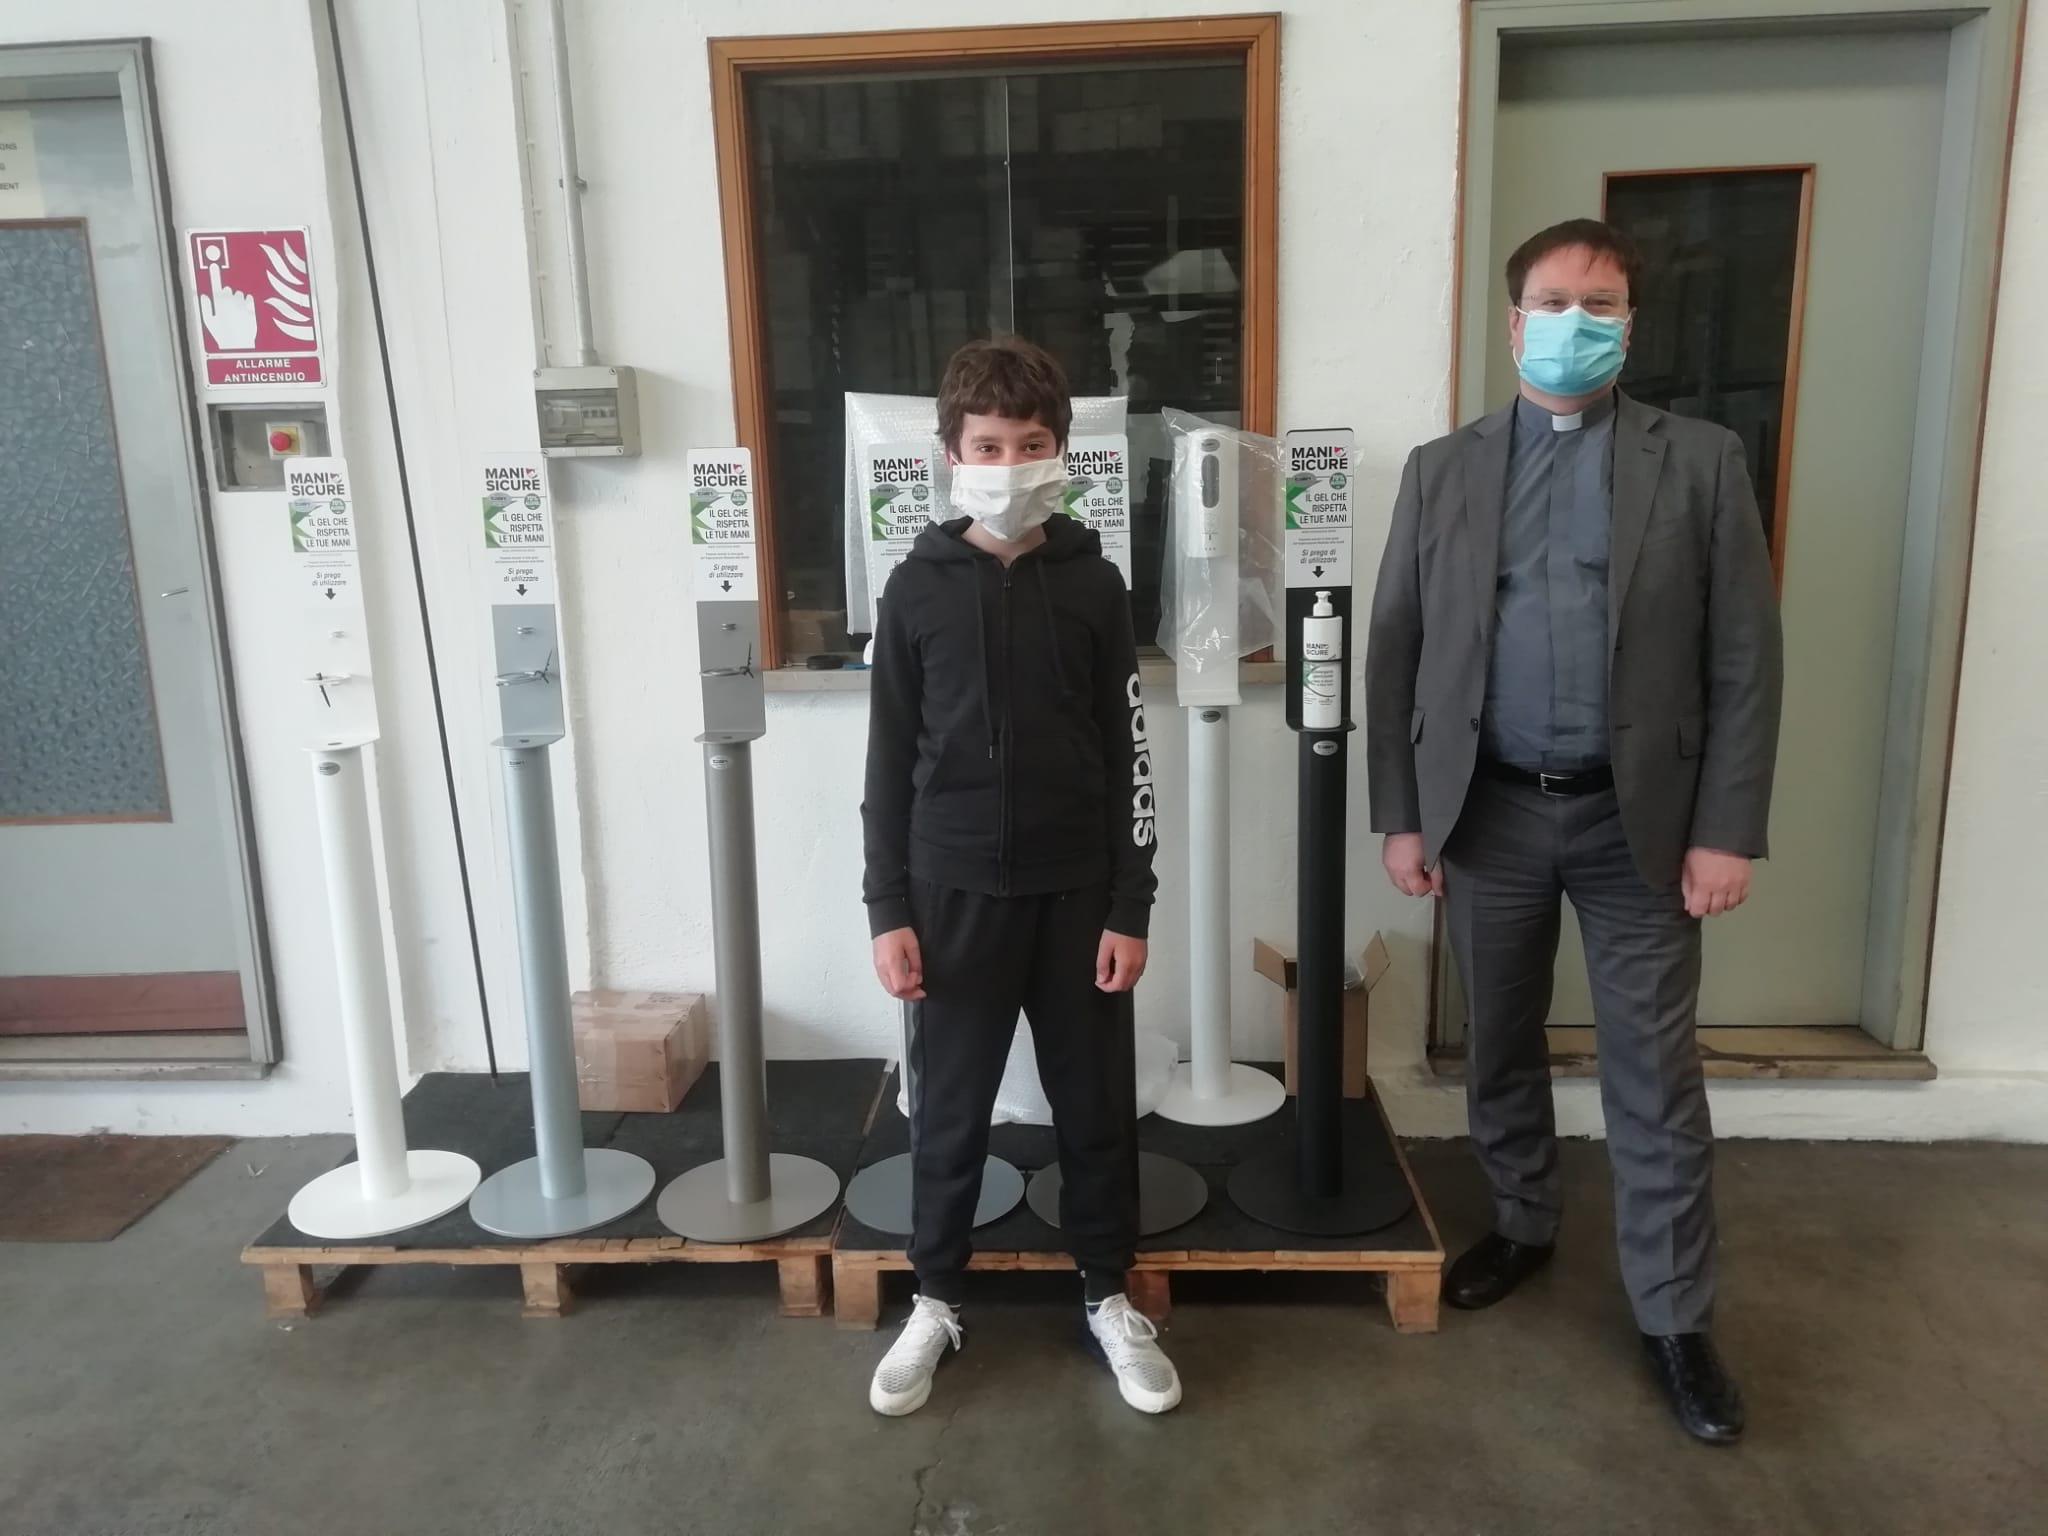 Talin dona a Caritas una colonna per dispenser di gel lavamani